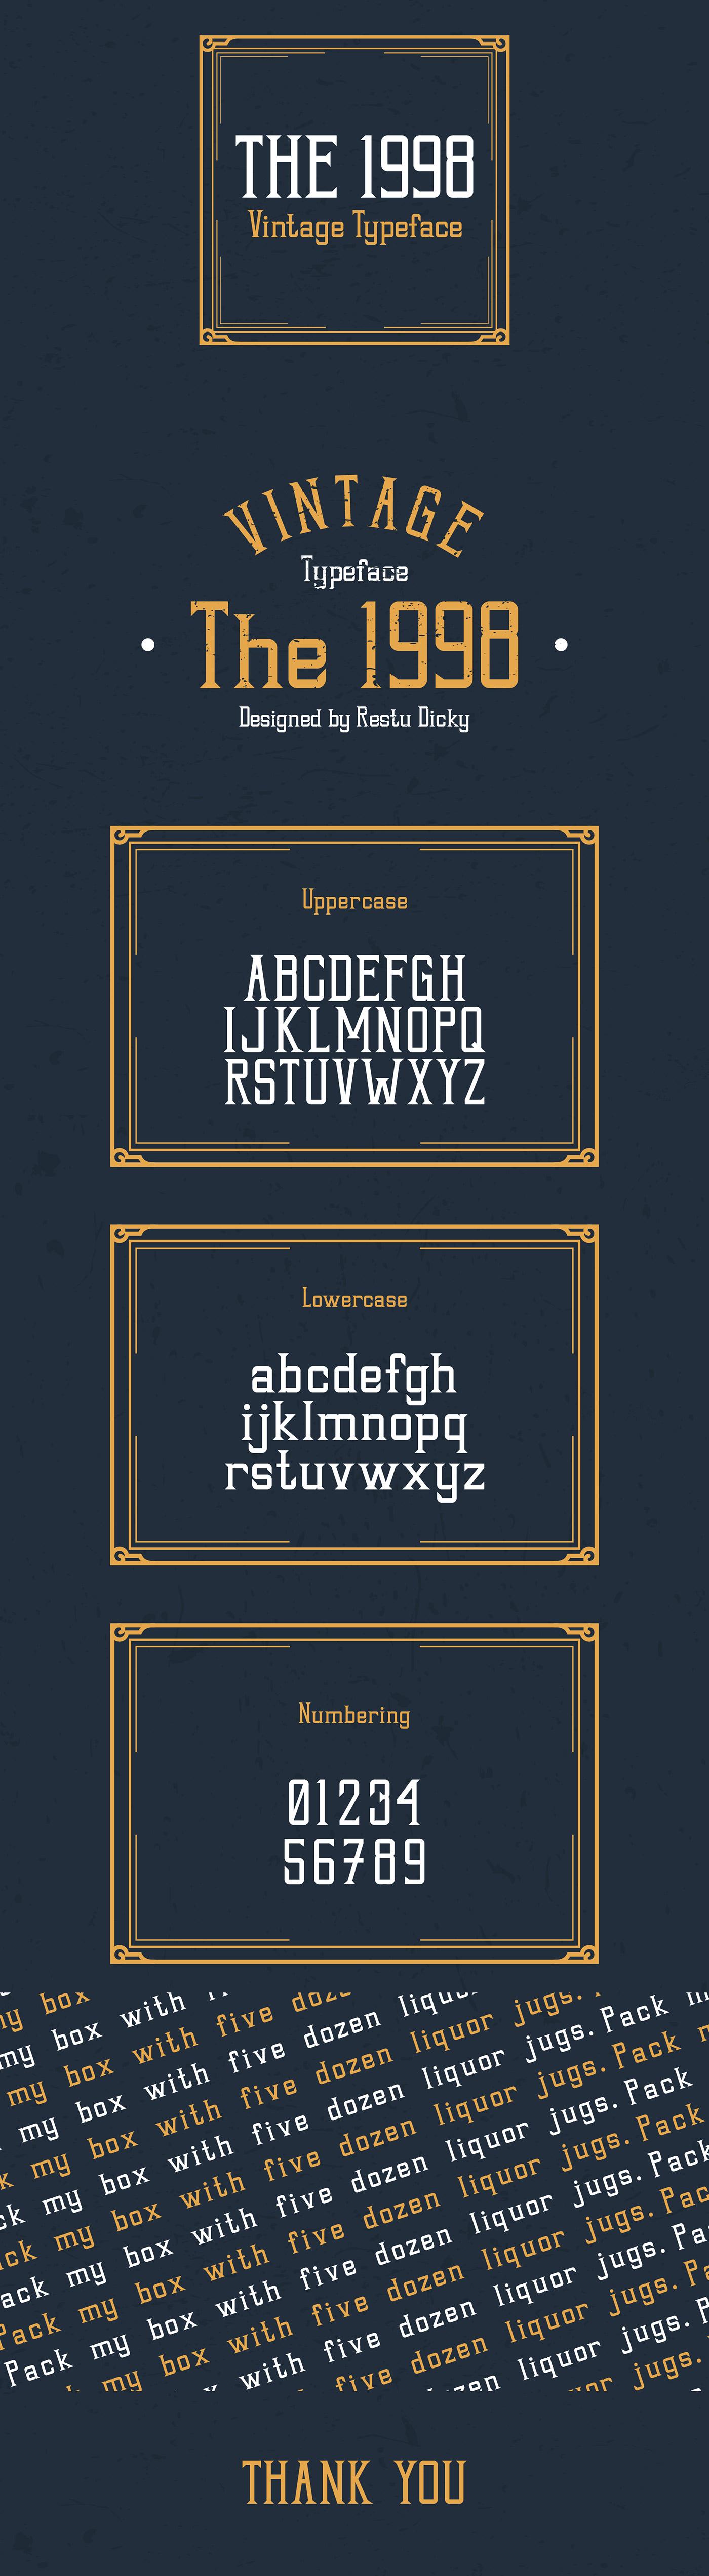 Typeface typography   type designer vintage style old style vintage type